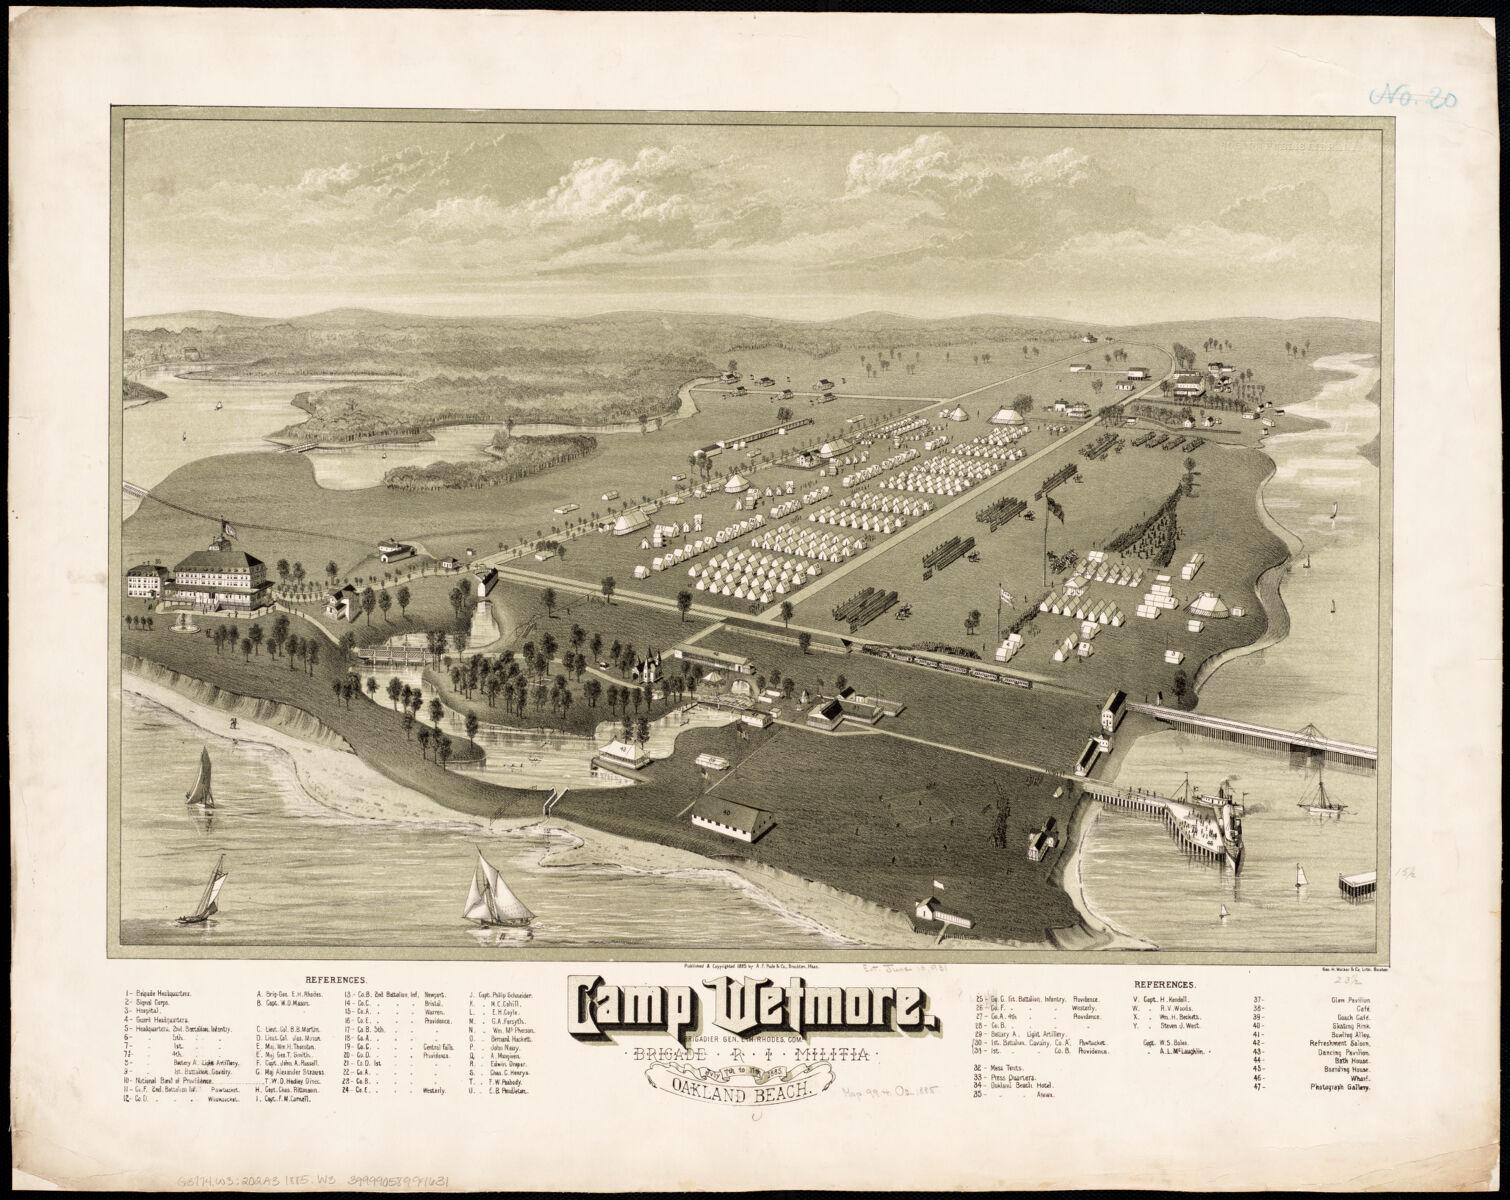 Geo. H. Walker & Co, and A.F. Poole & Co, Camp Wetmore, R.I. brigade militia, July 7th to 11th, 1885, Oakland Beach (1885)